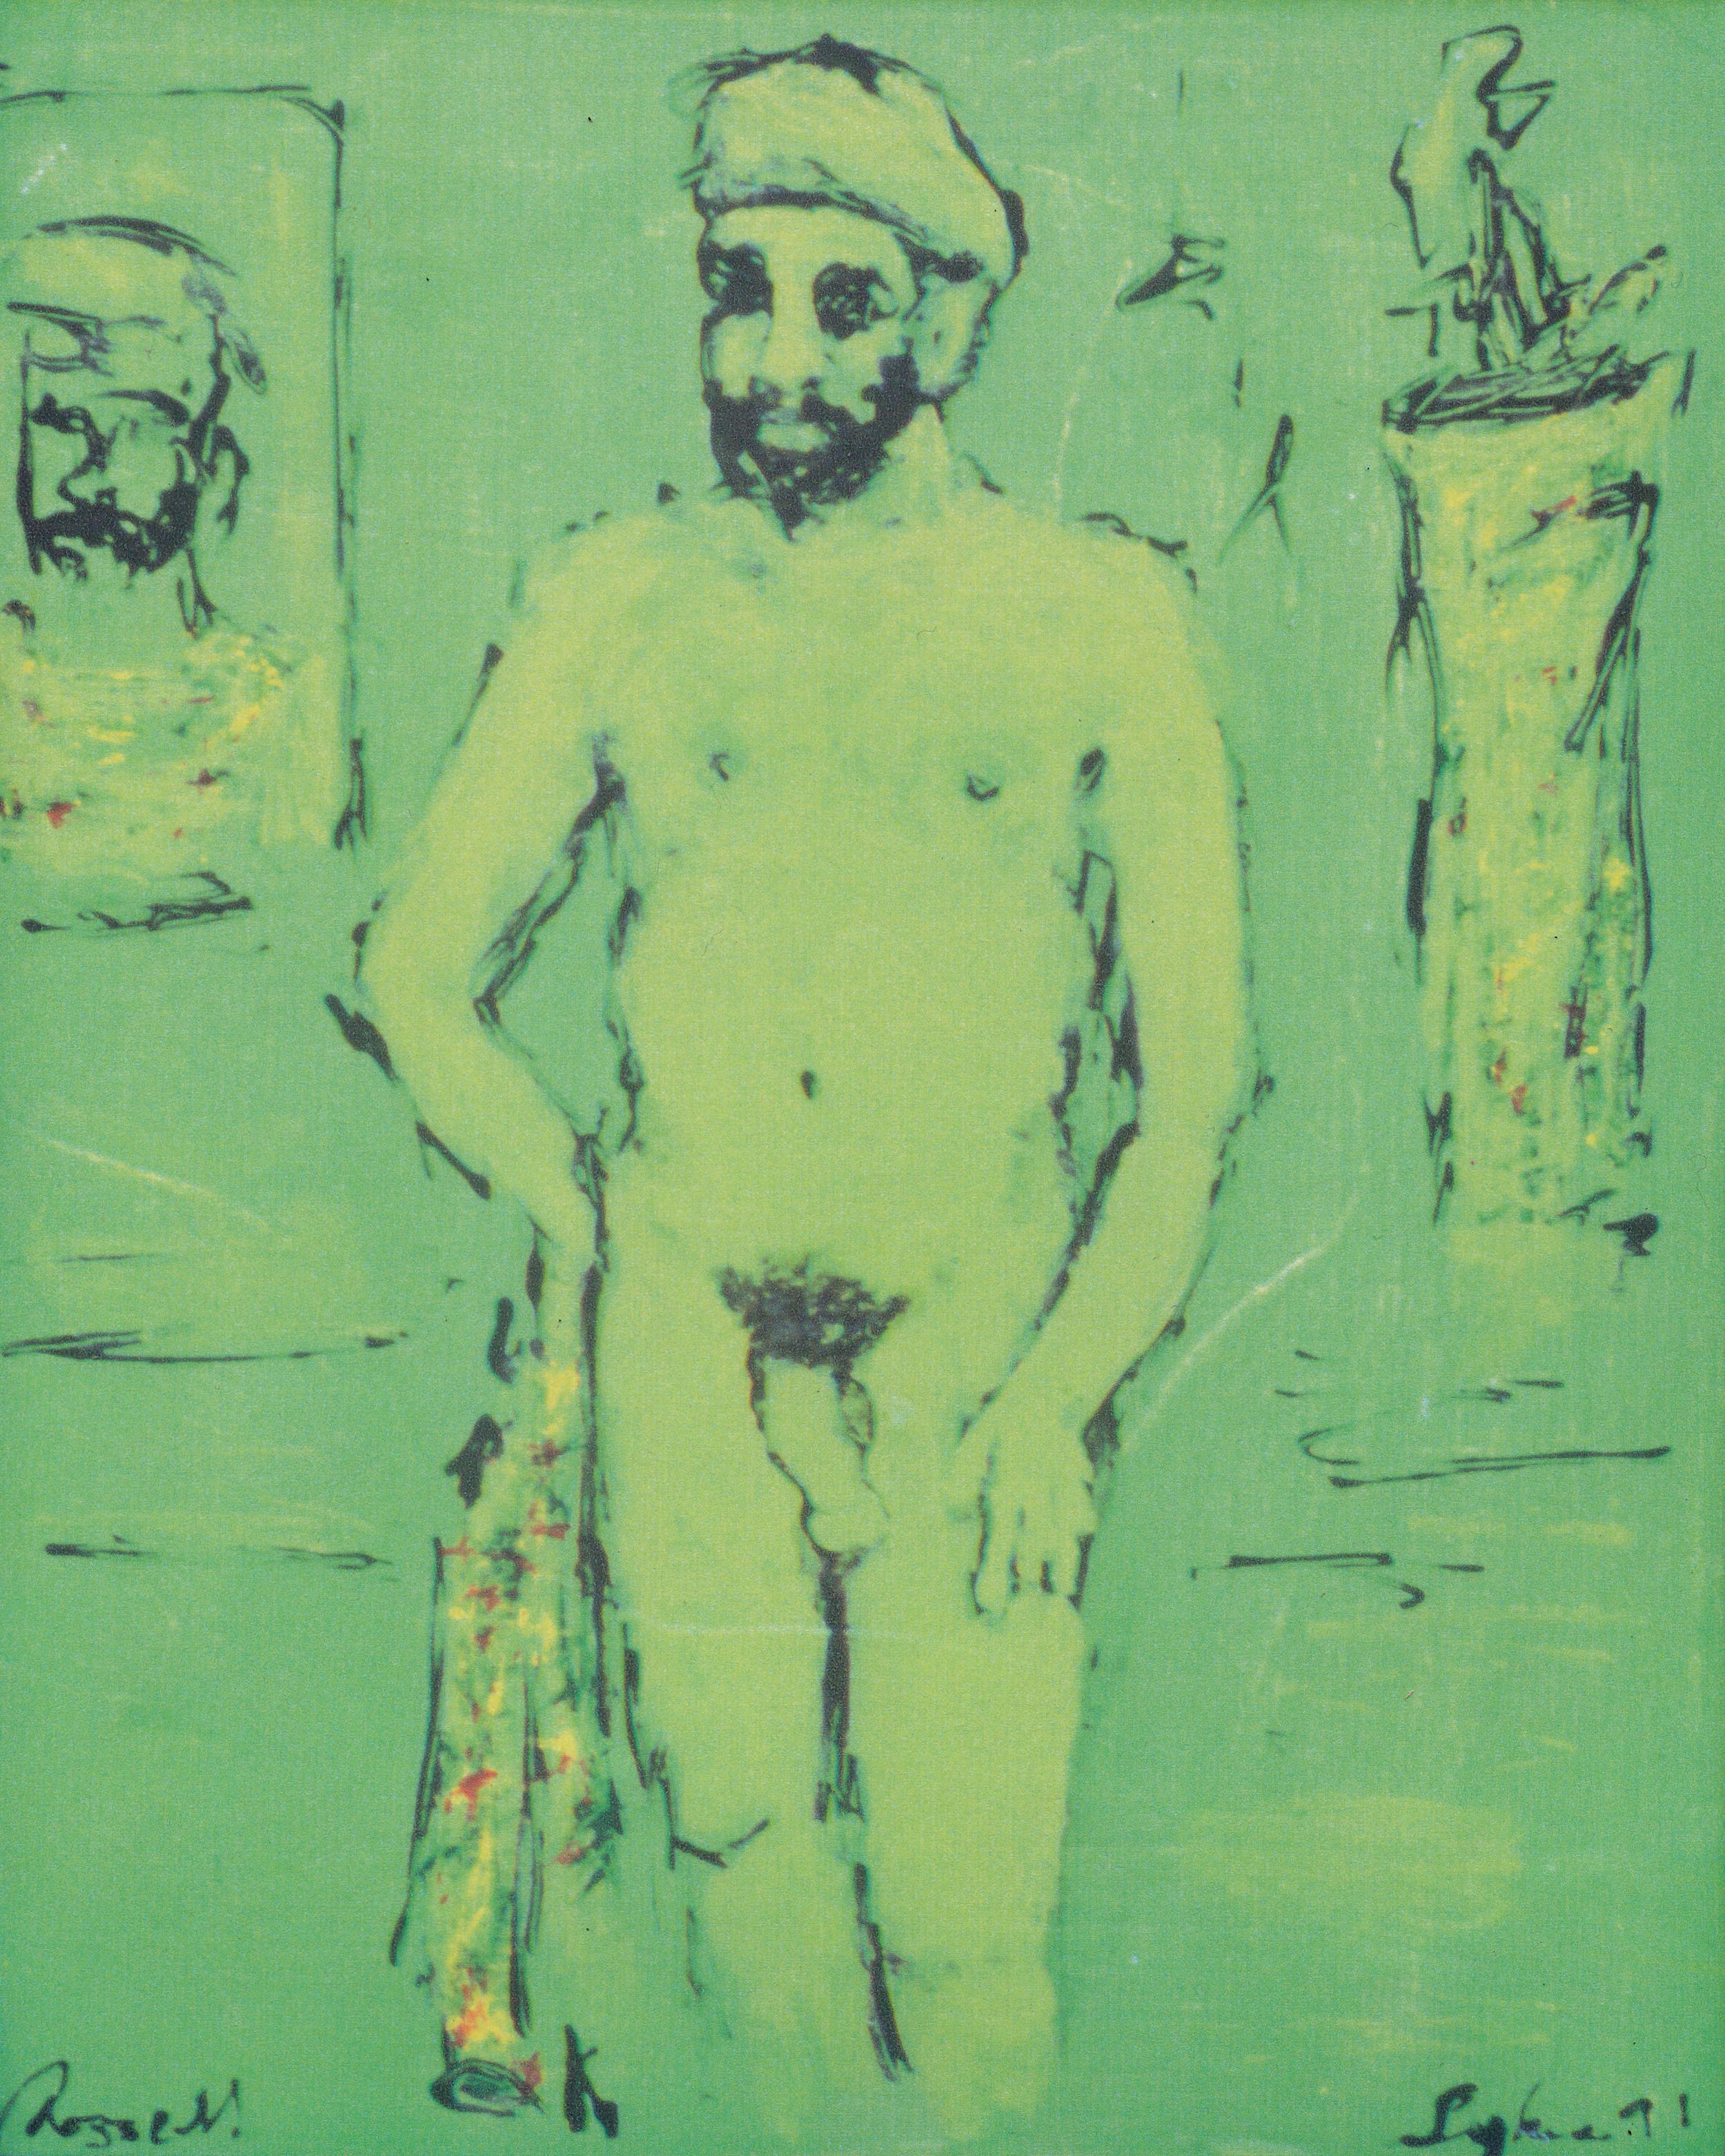 Untitled, Self Portrait, 1991